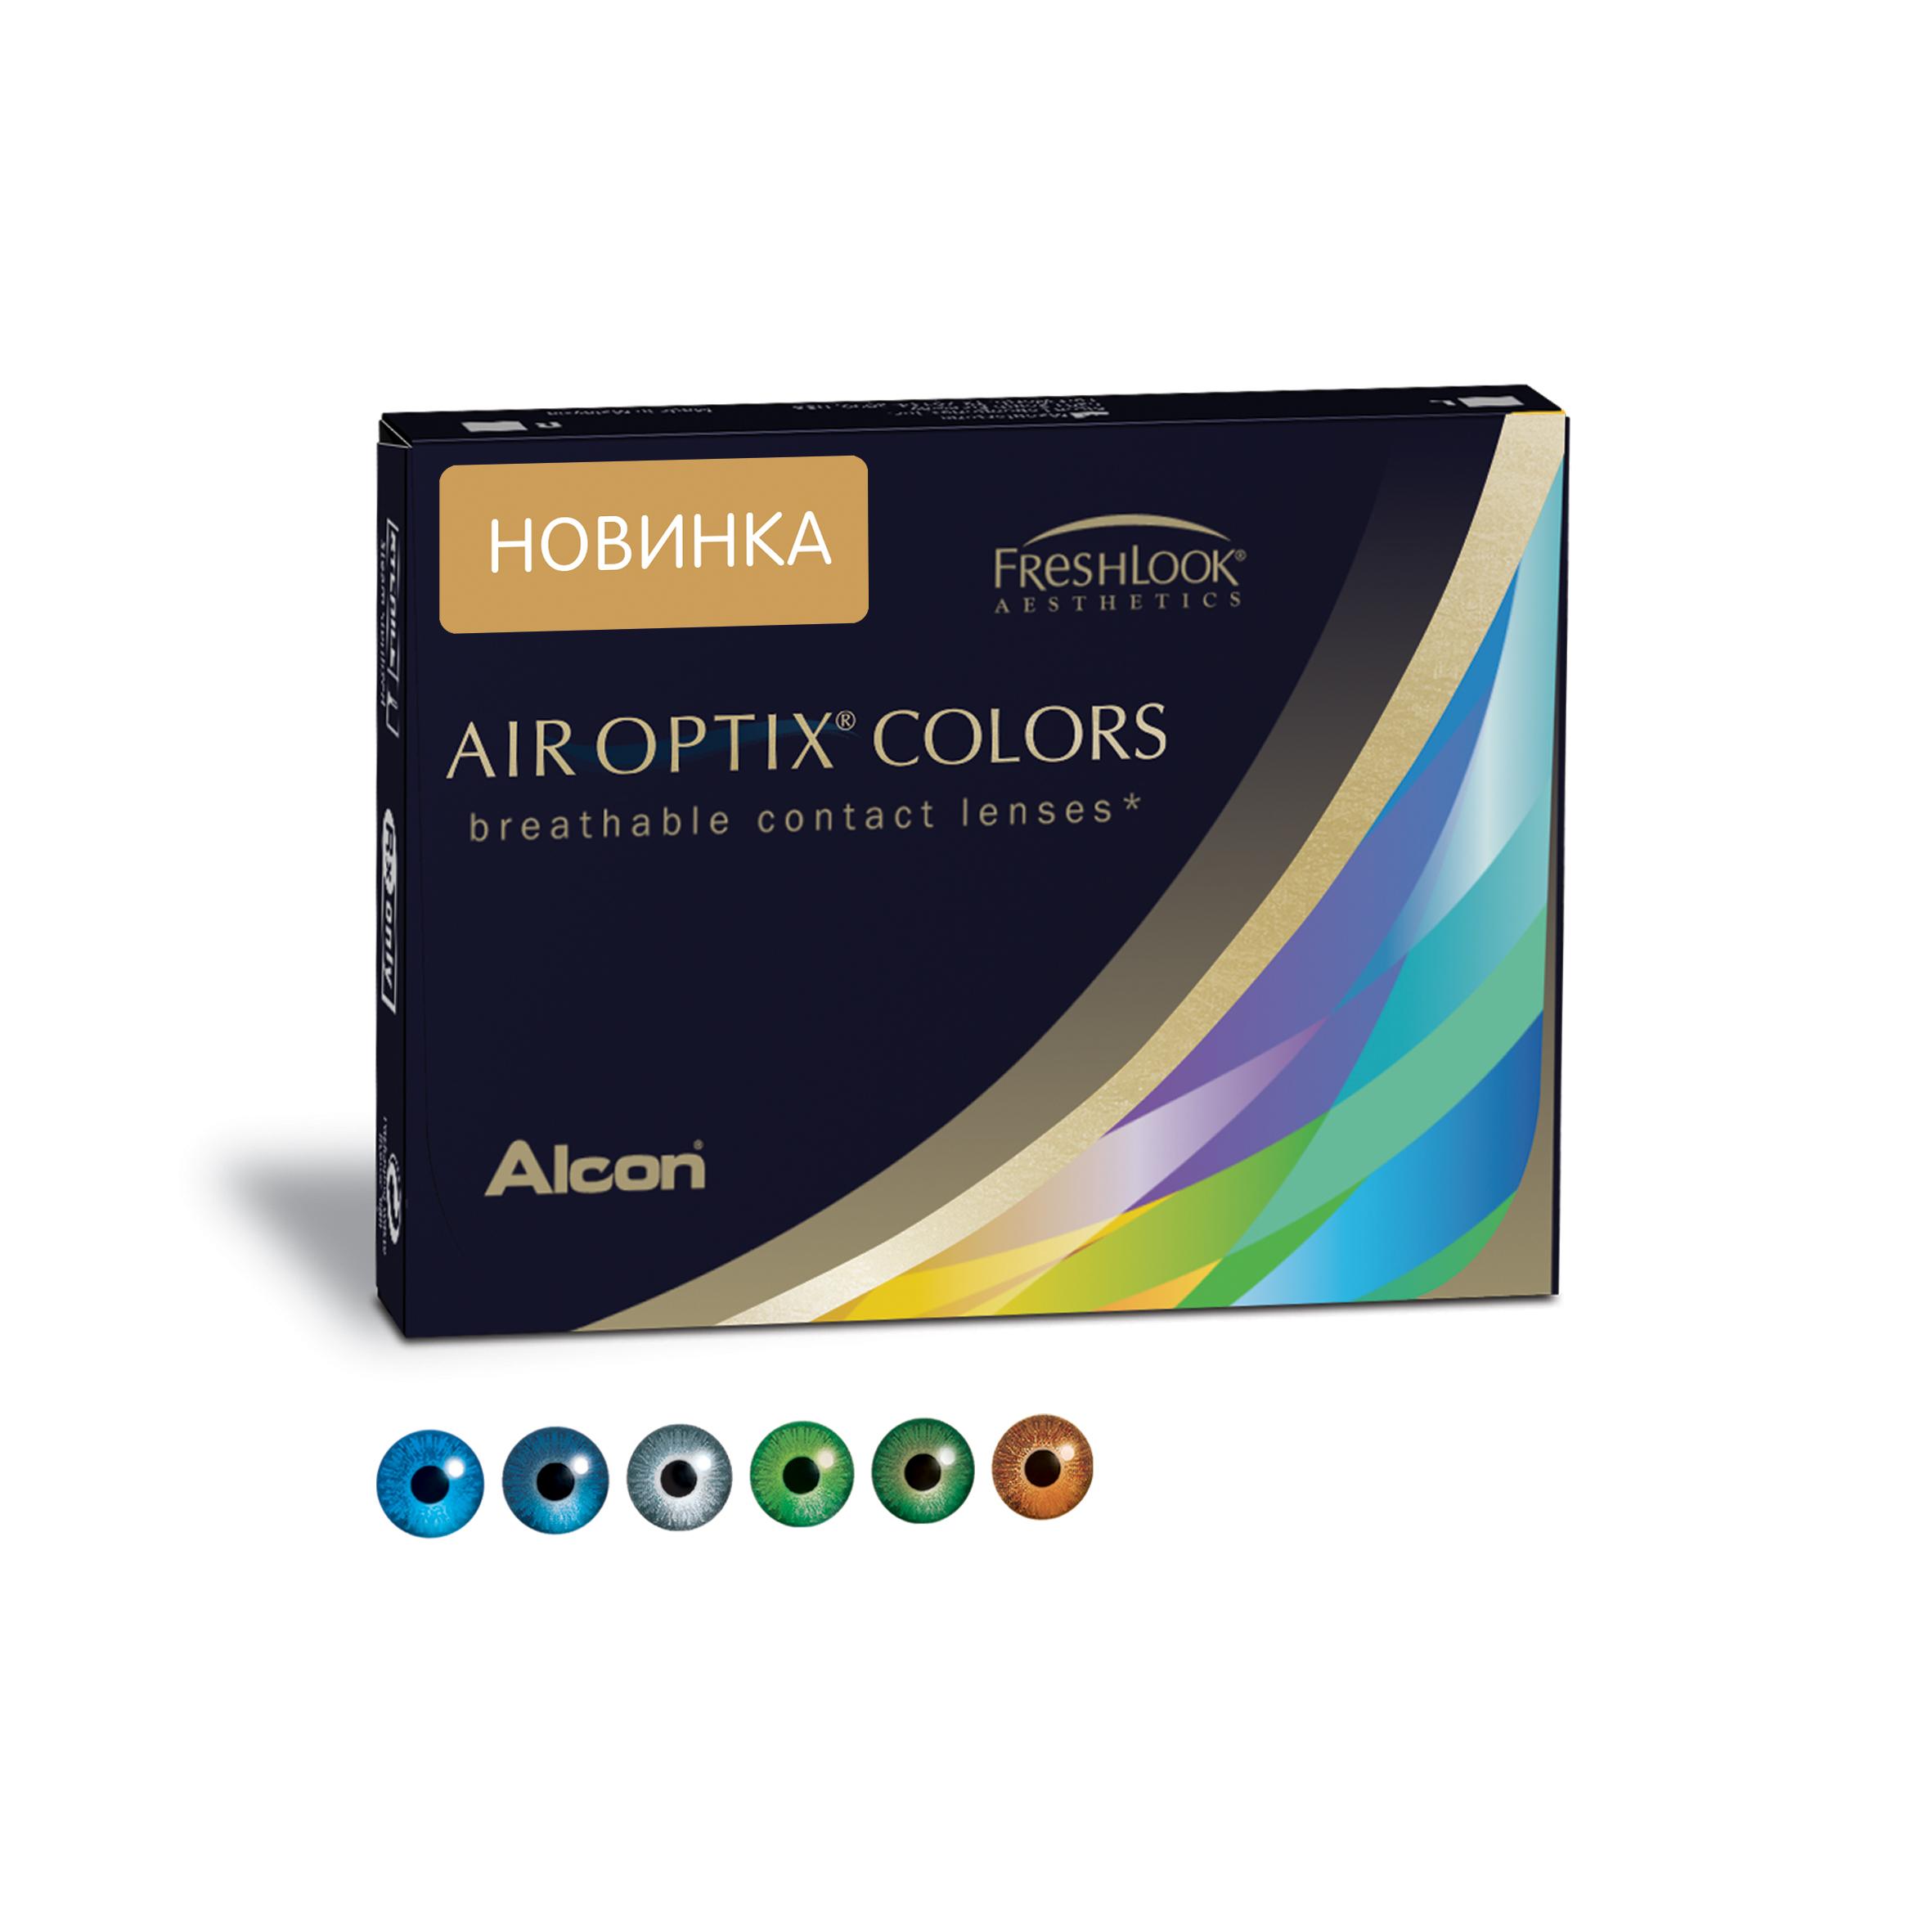 Аlcon контактные линзы Air Optix Colors 2 шт -6.00 Sterling Gray31746309Мягкие контактные линзы